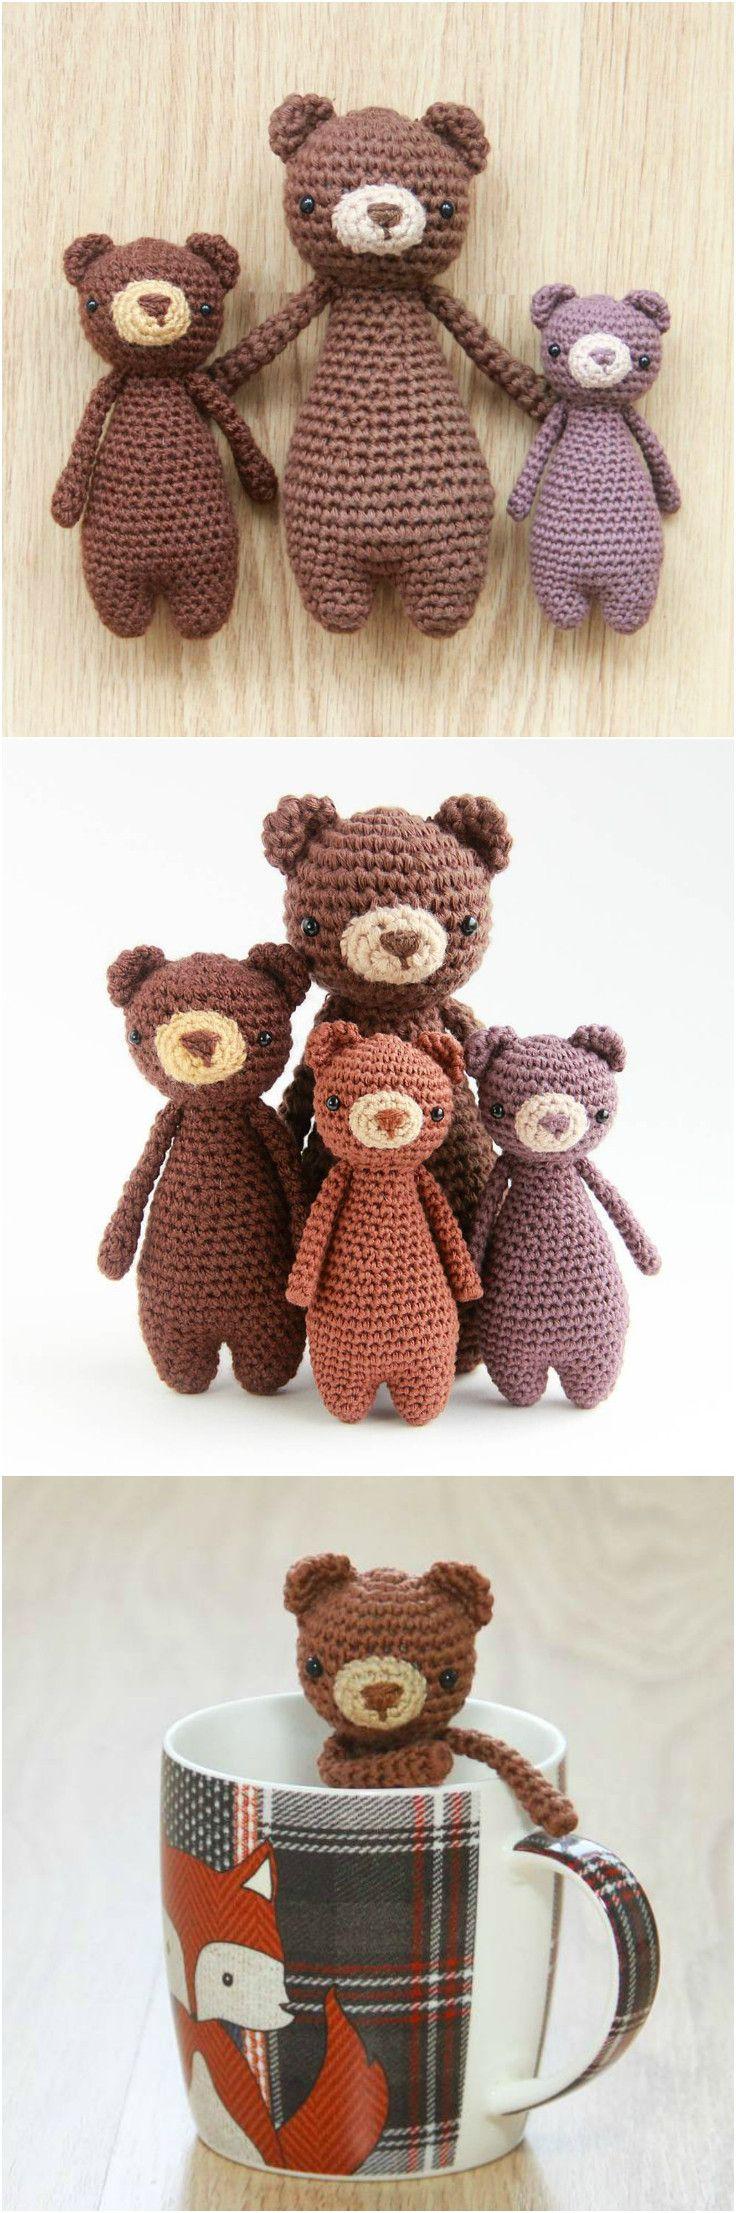 222 best Amigurumi images on Pinterest | Crochet toys, Crochet ...